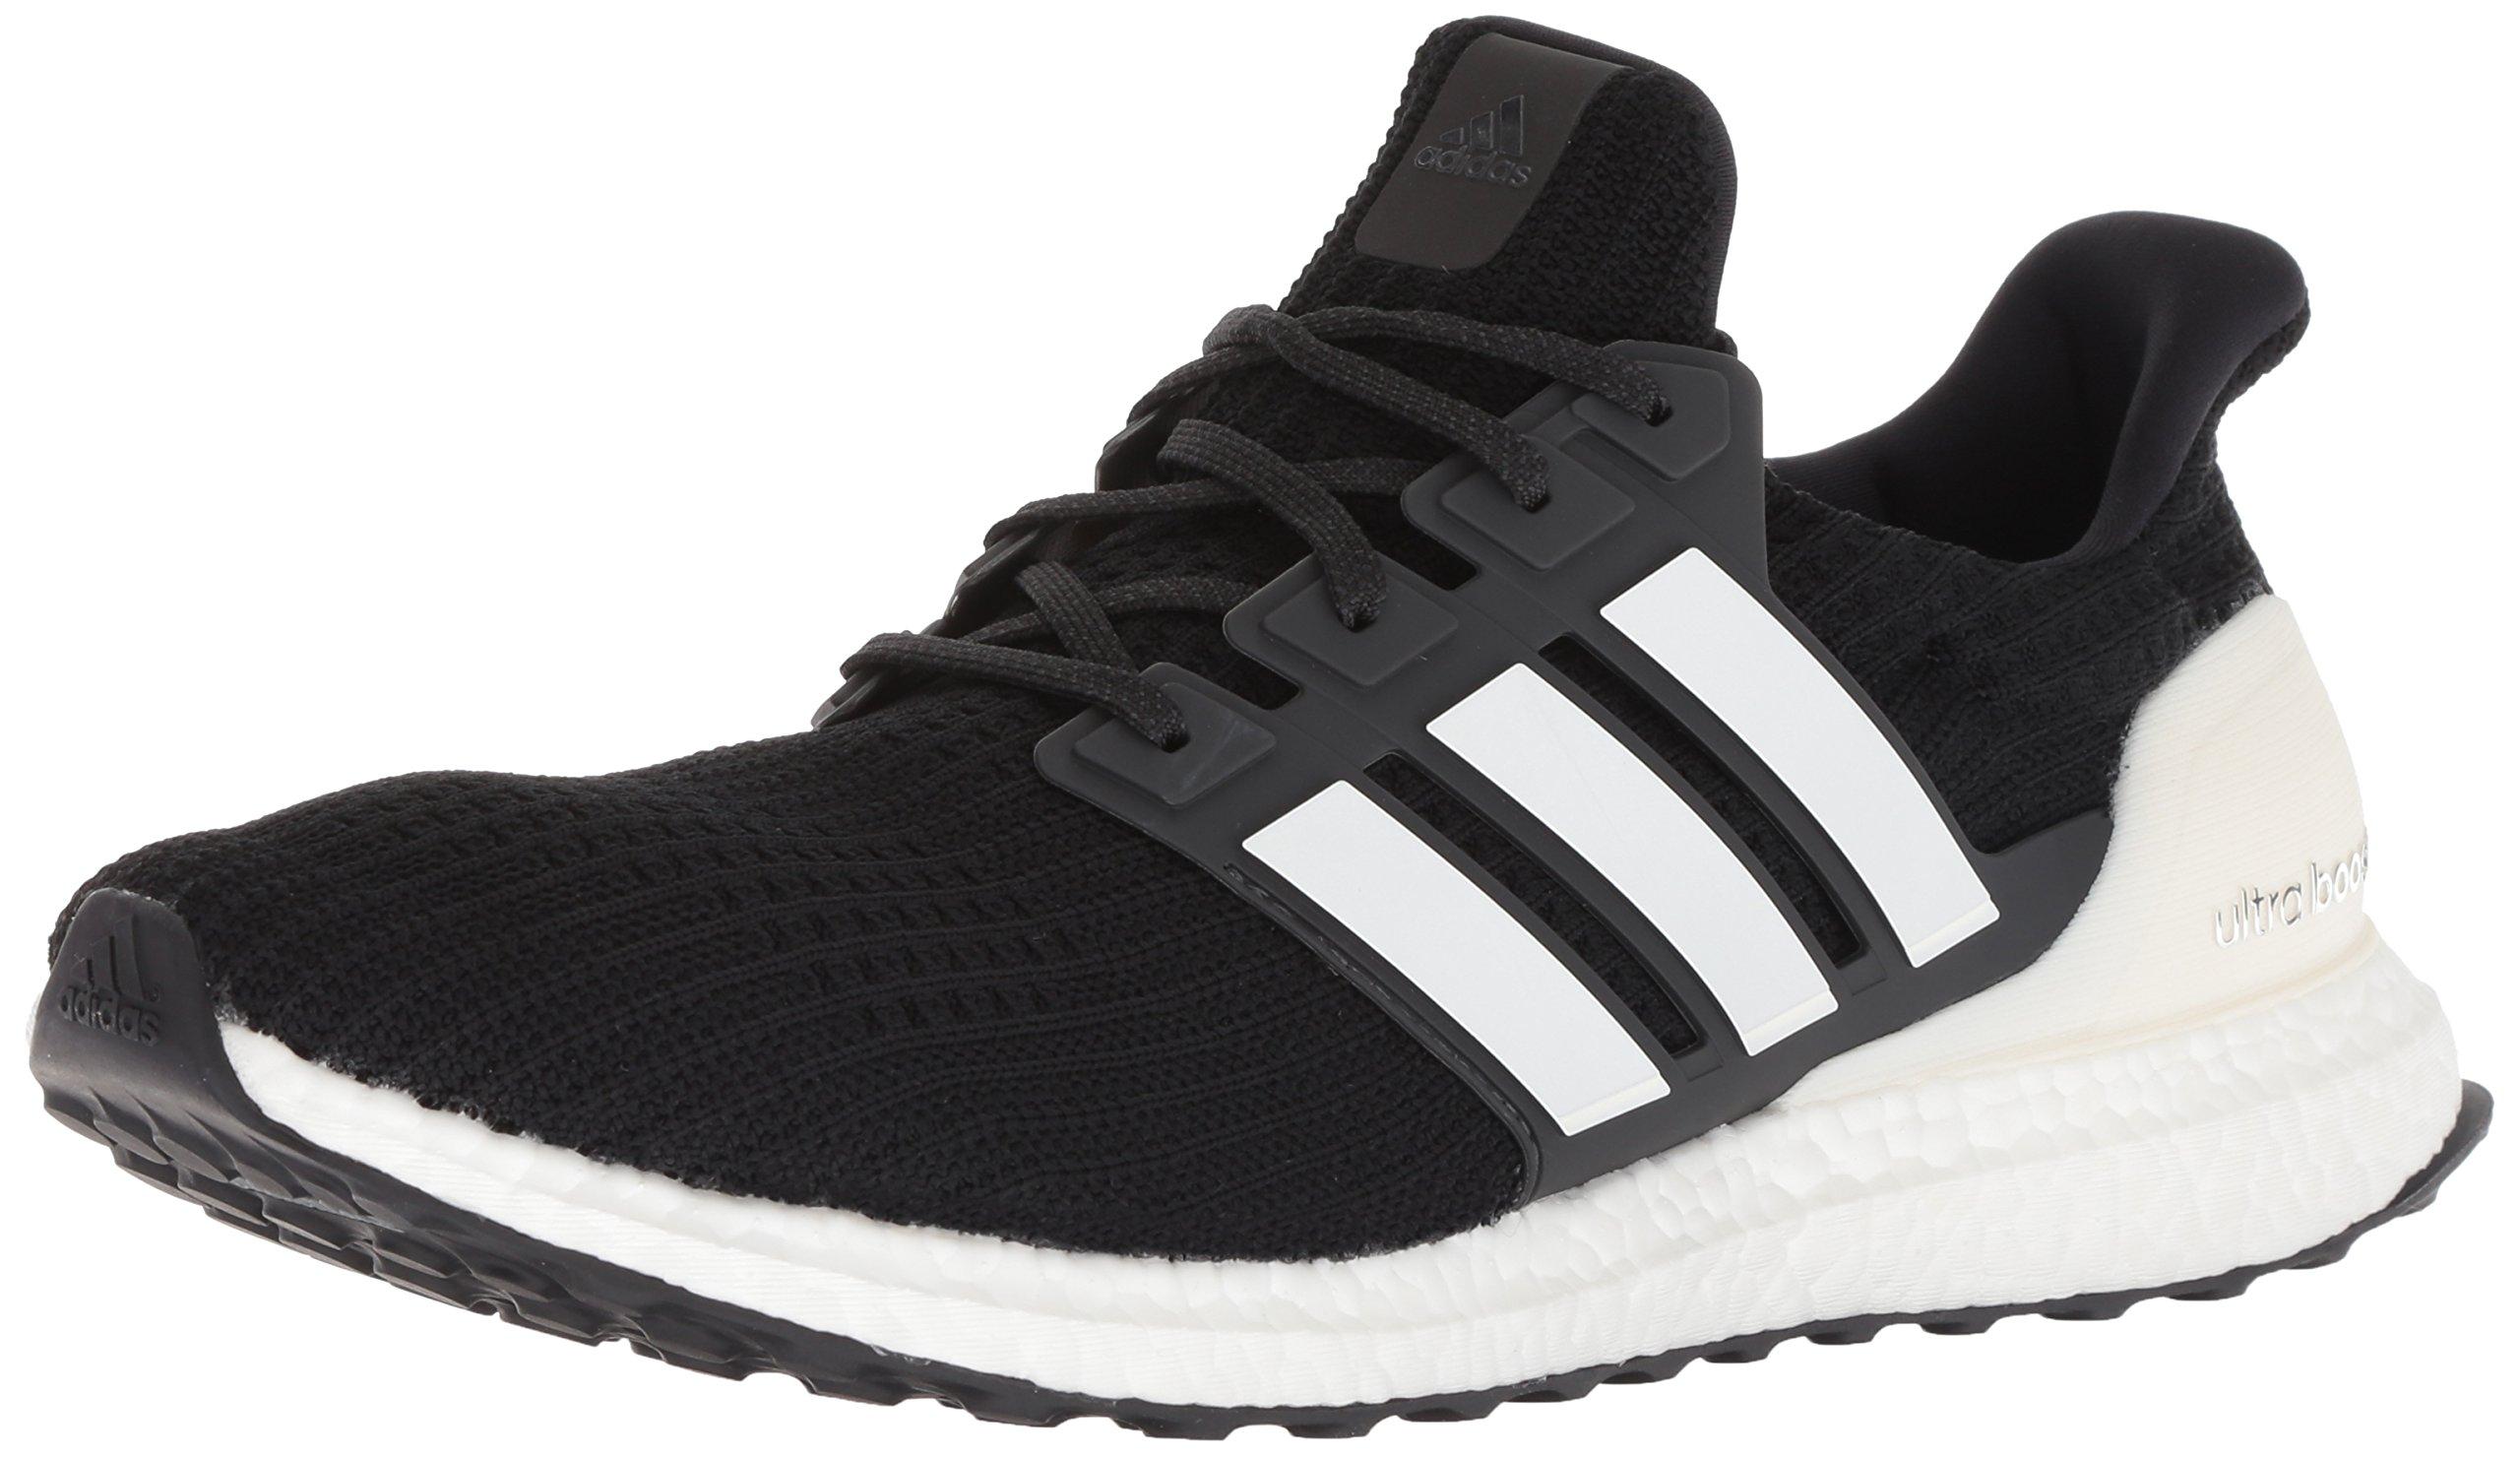 adidas Men's Ultraboost Running Shoe, BlackCloud WhiteCarbon, 11.5 M US